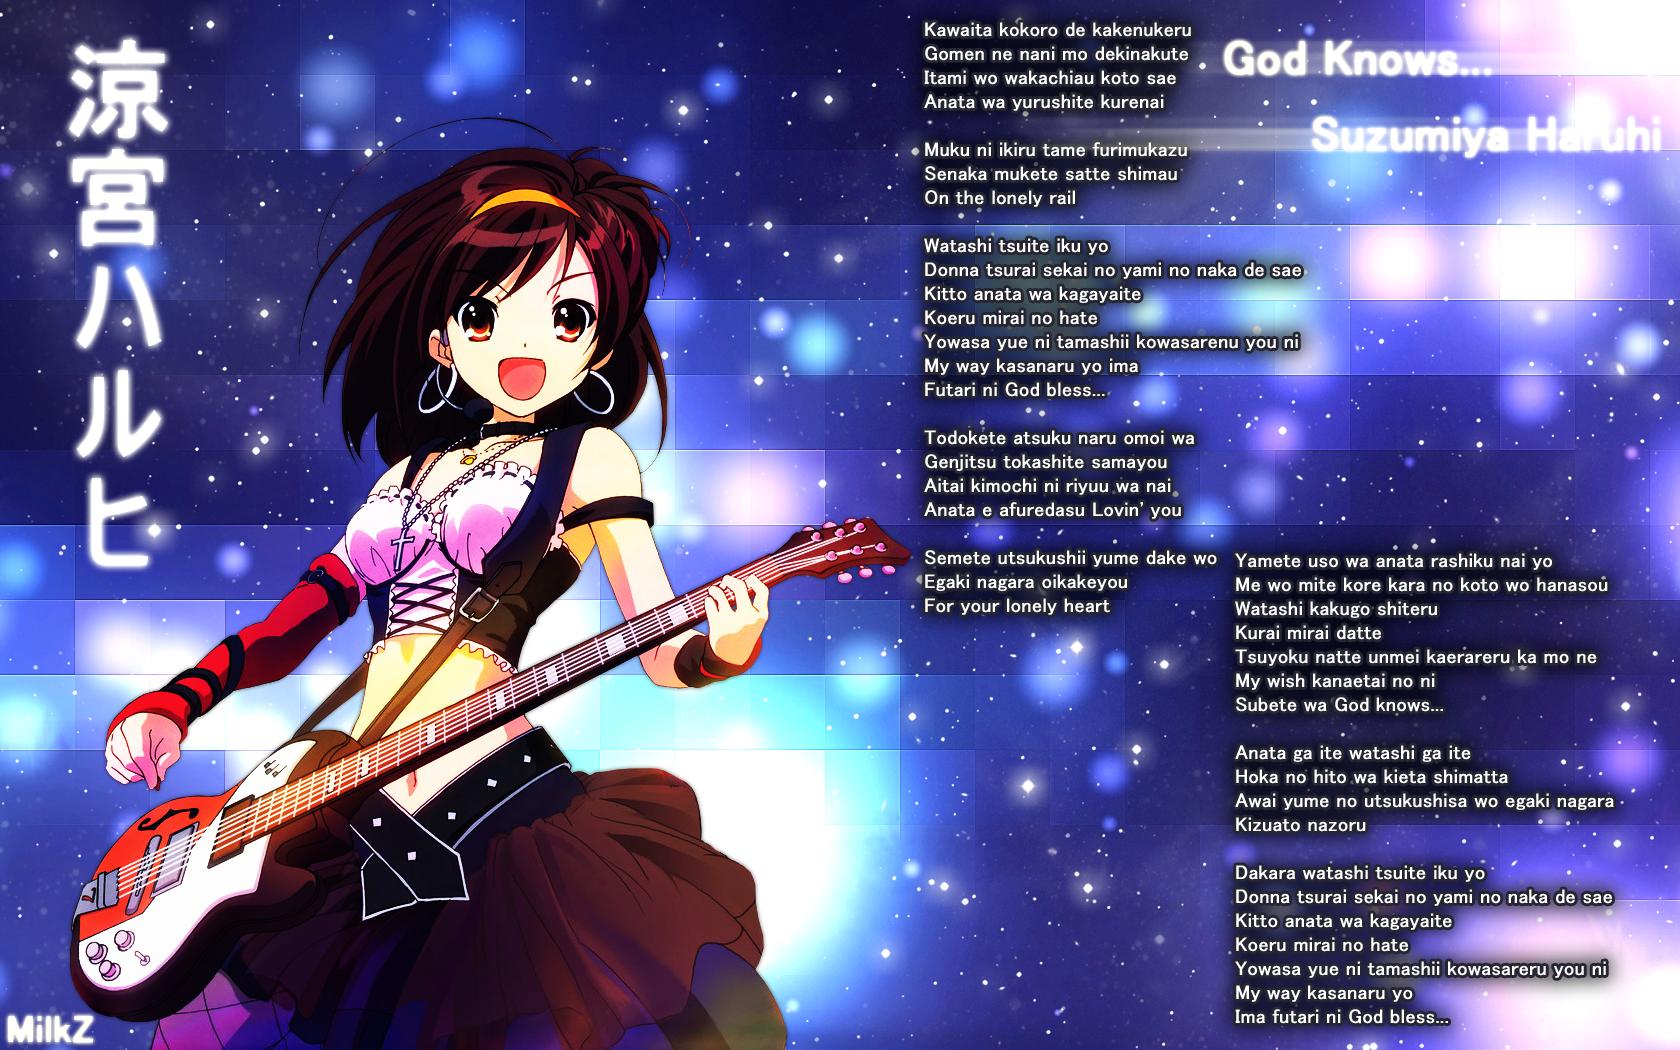 God Knows...